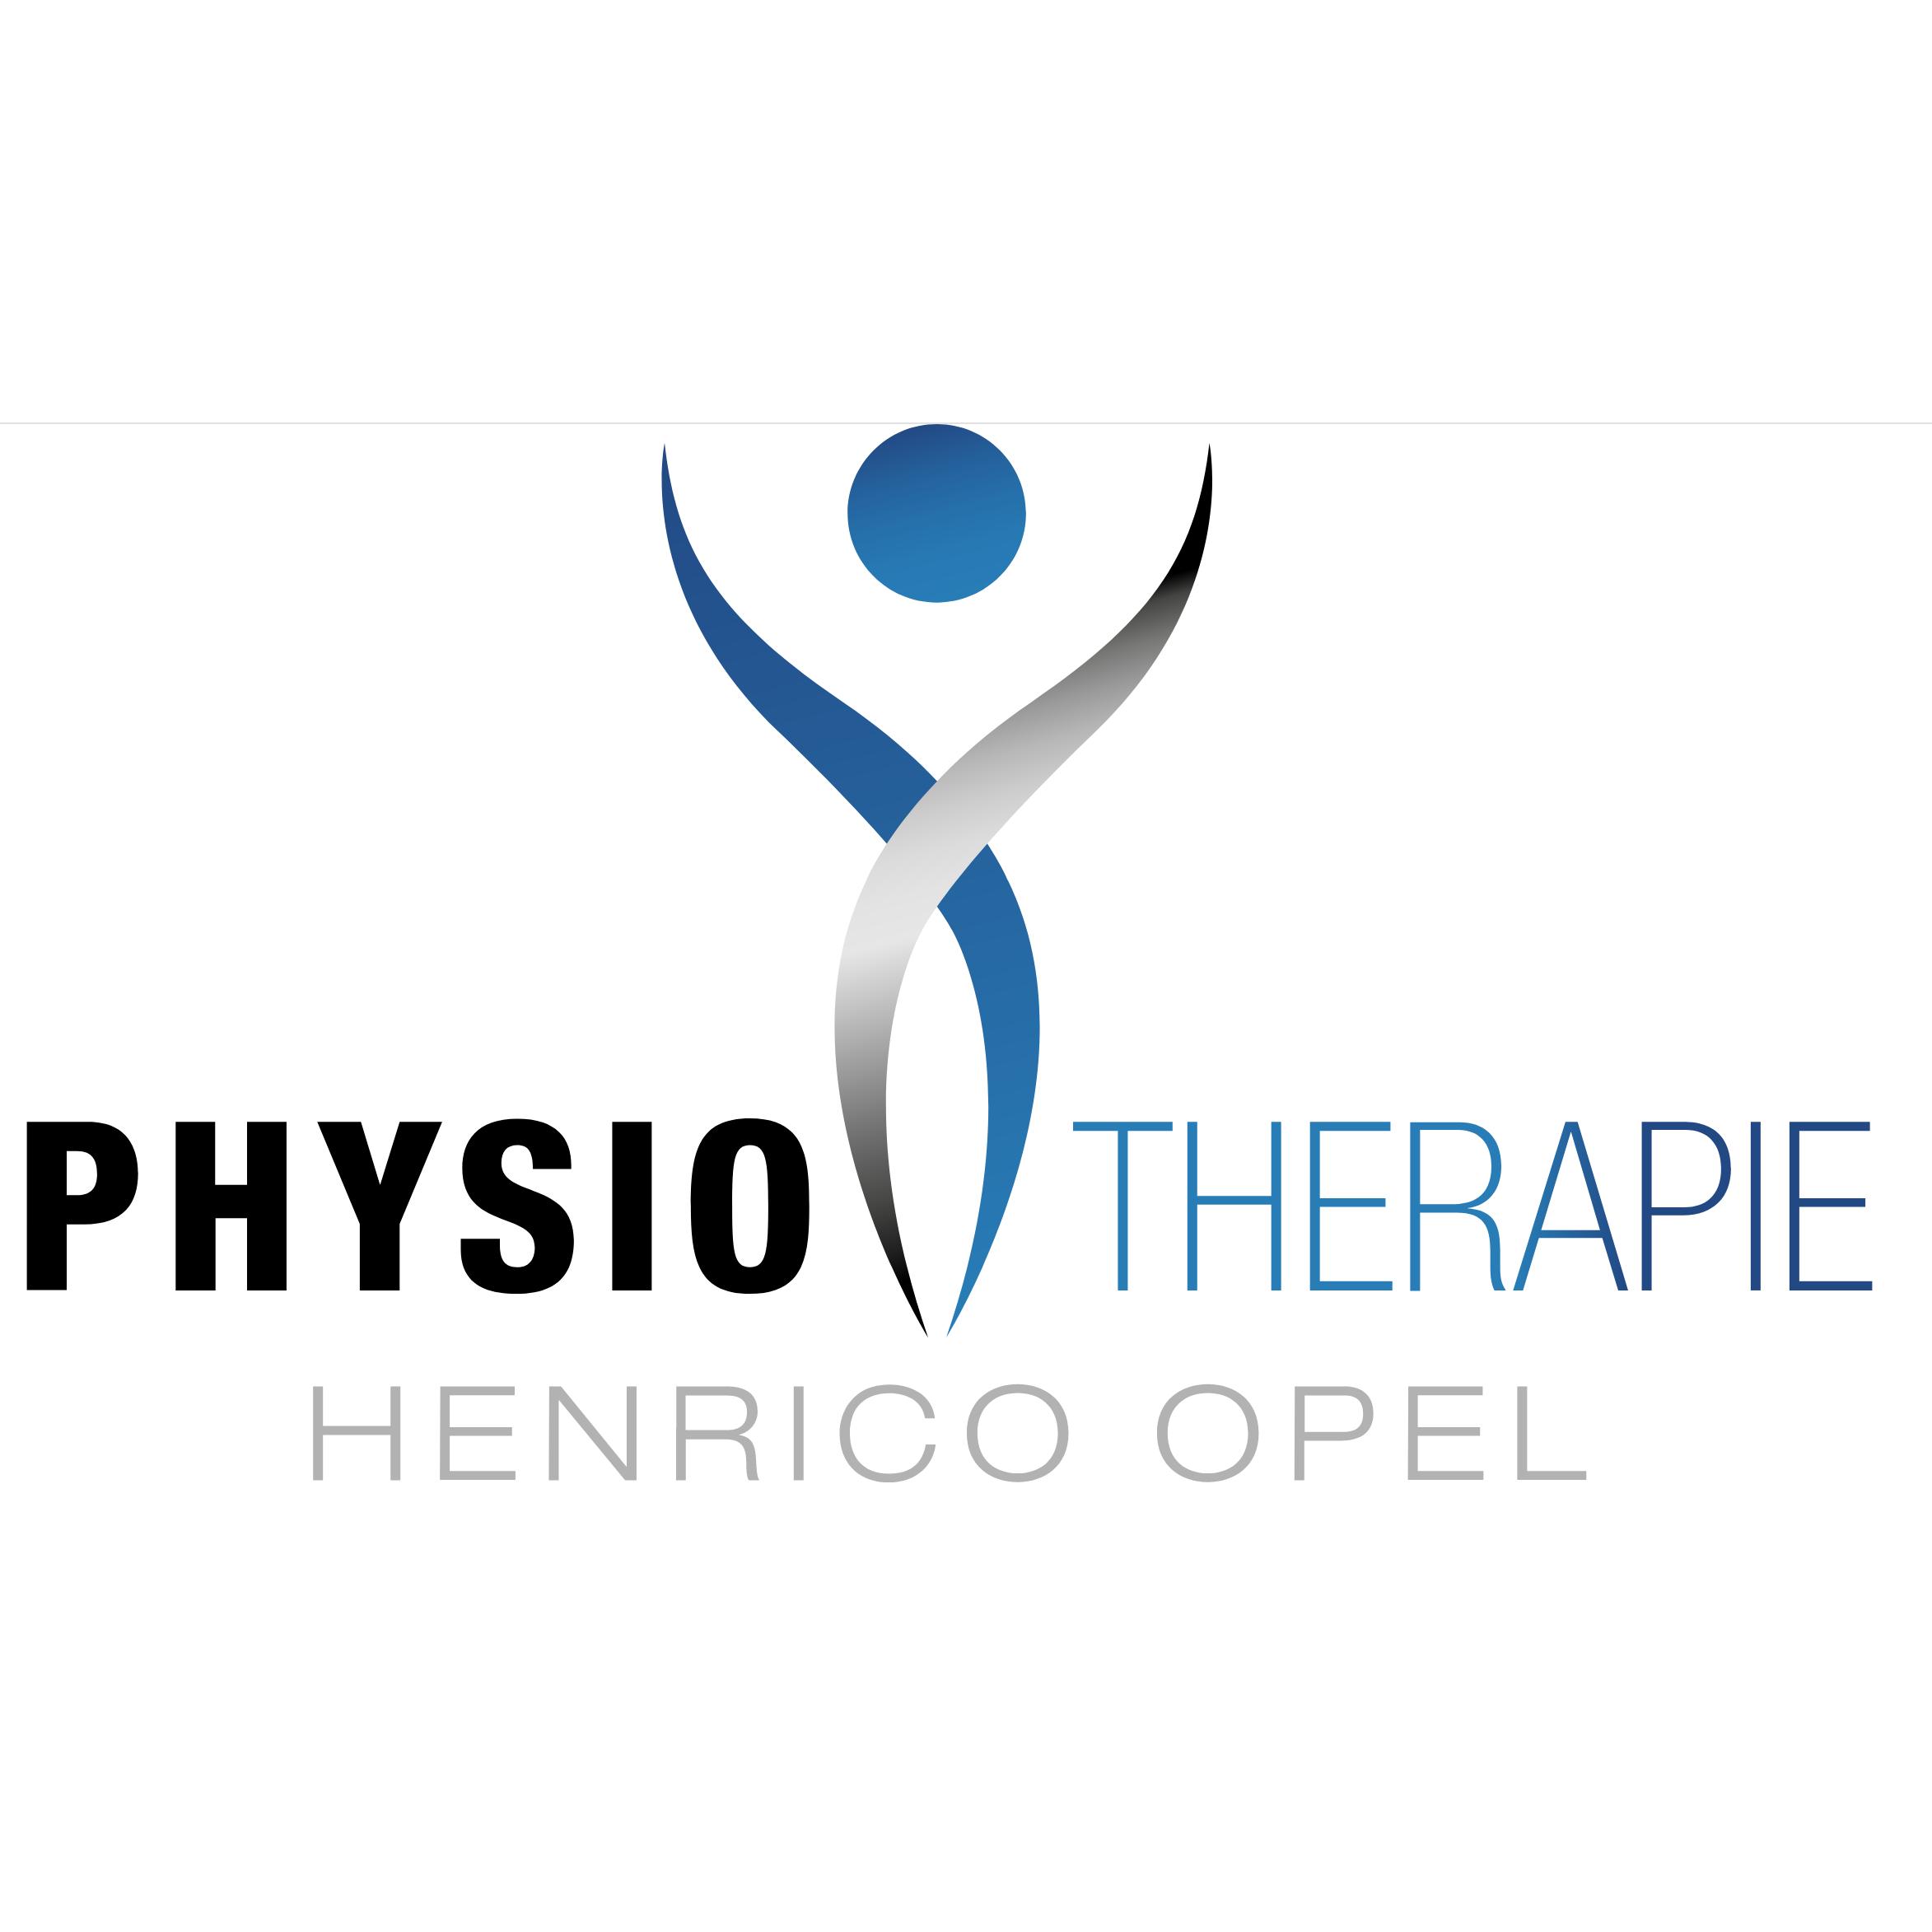 Physiotherapie Henrico Opel